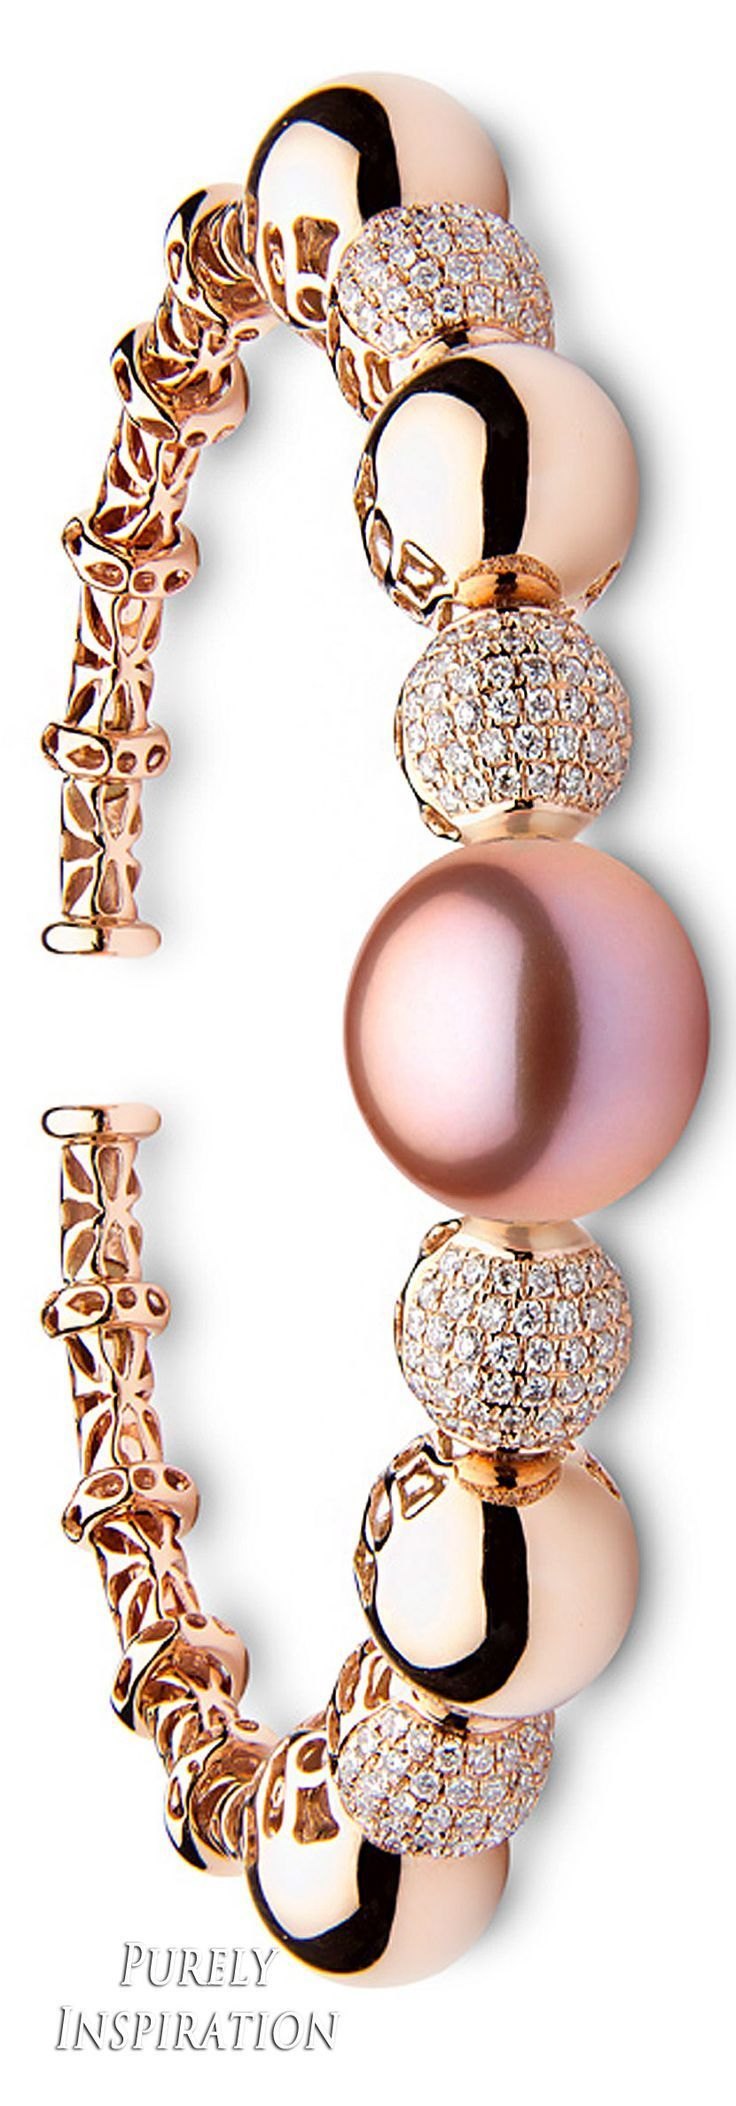 Yoko London Aurelia Bracelet 18k gold, diamonds, golden south sea pearls | Purely Inspiration